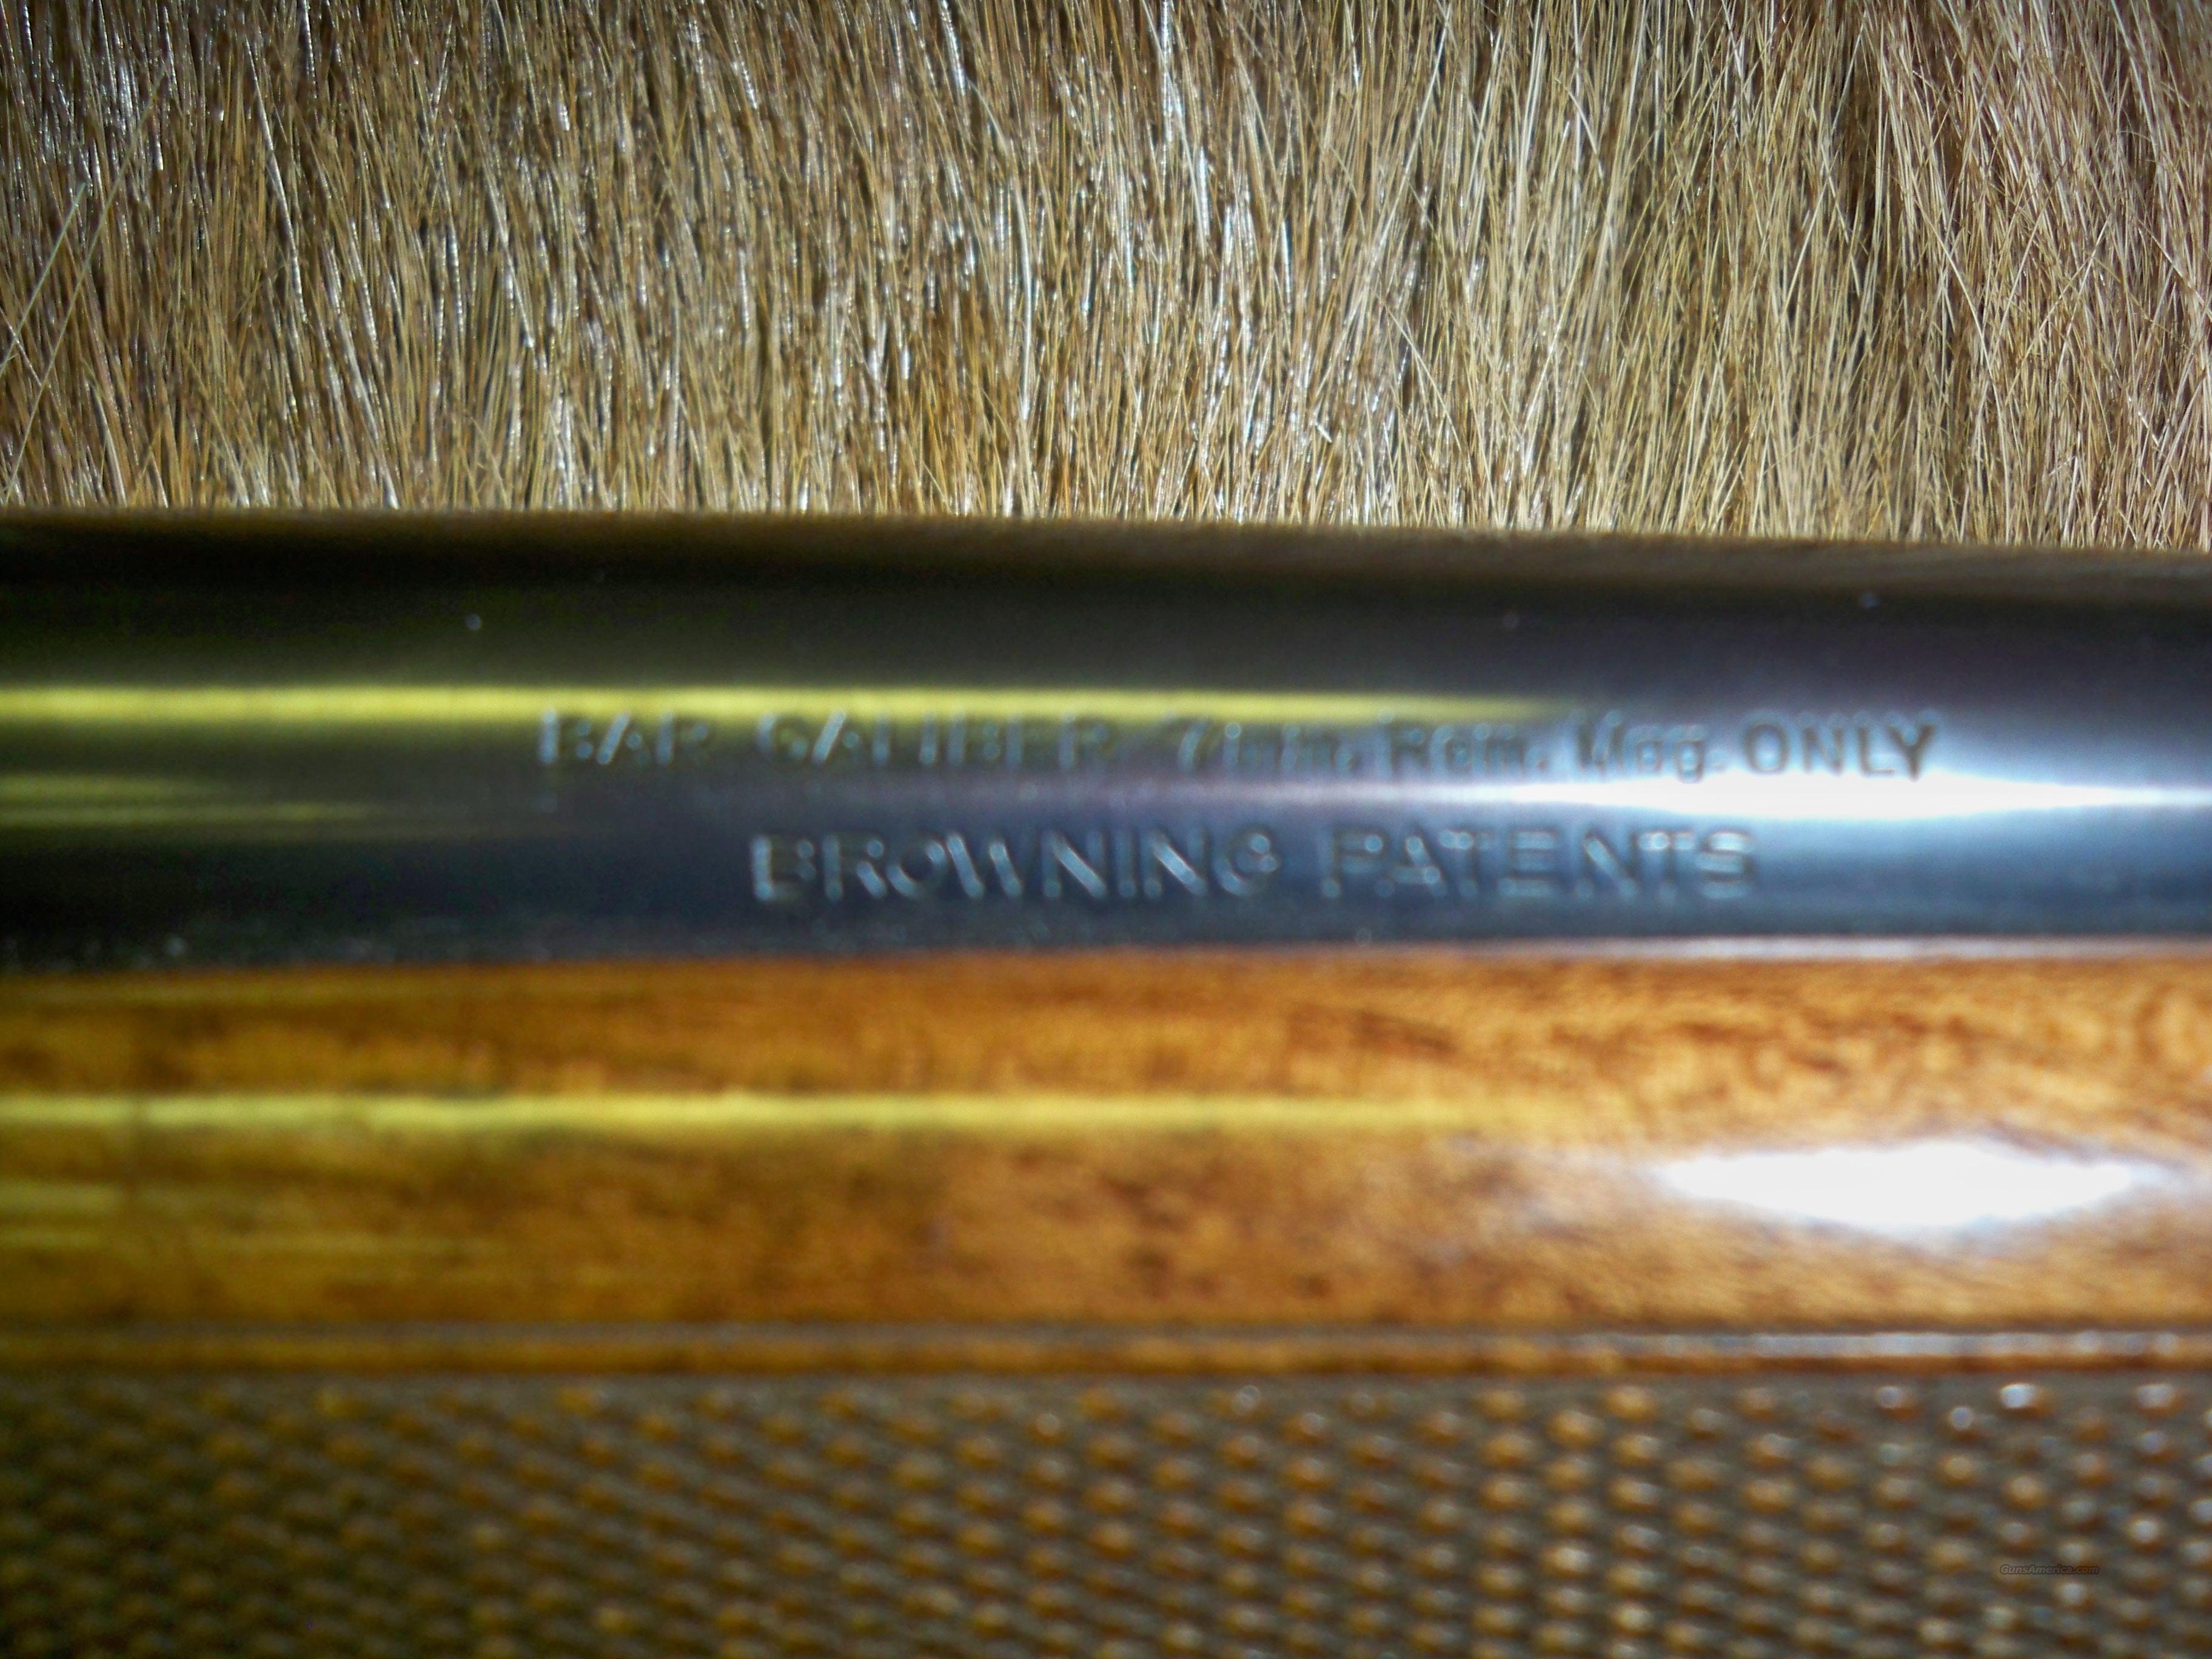 Browning 7mm mag wood stock